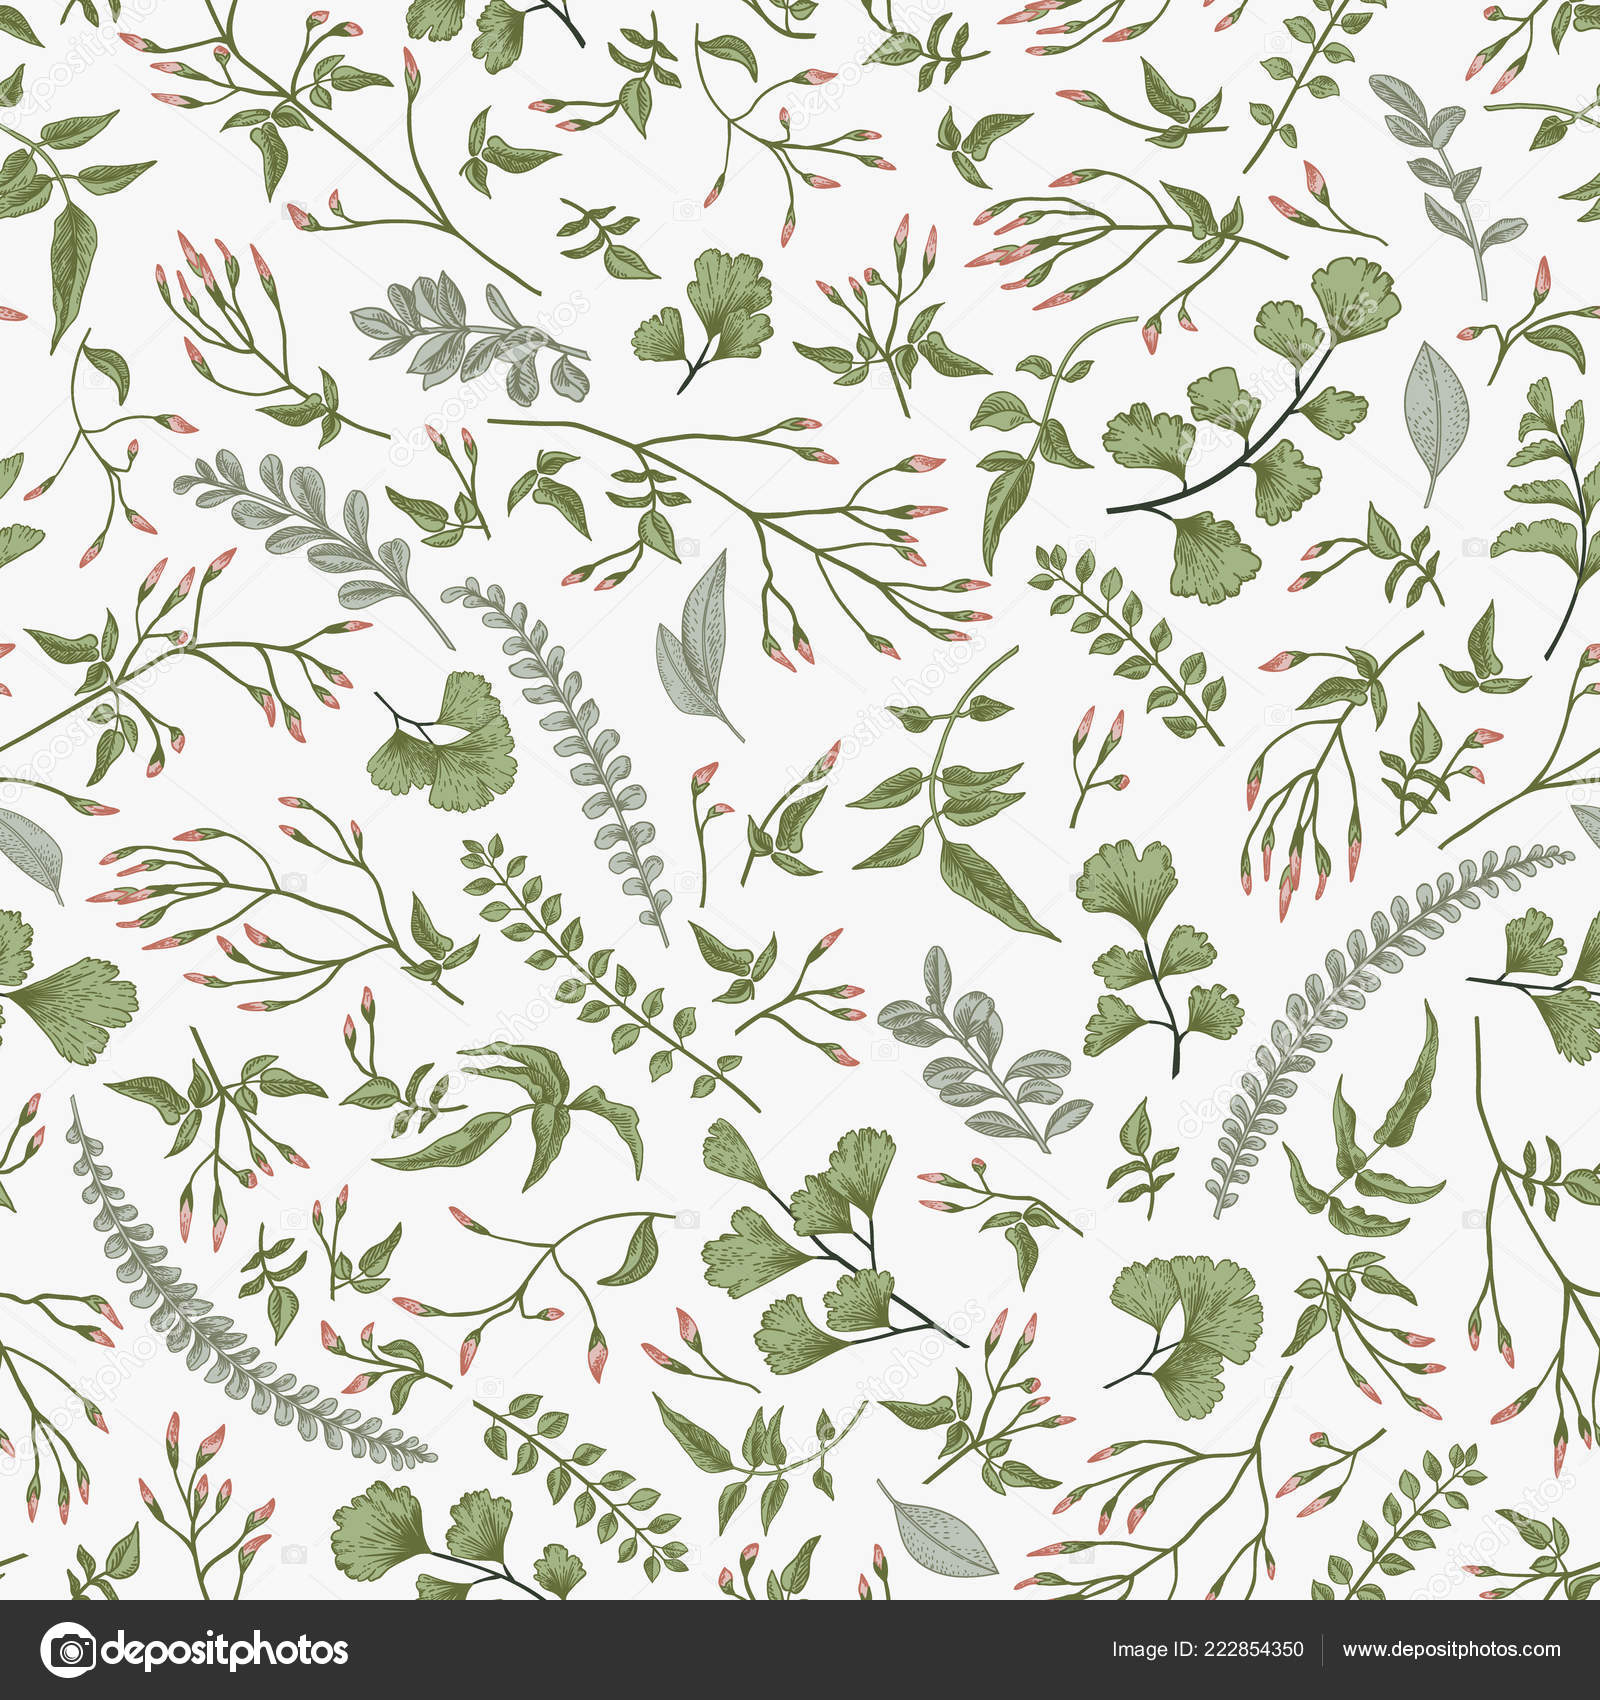 Seamless Floral Pattern Vintage Style Leaves Herbs Botanical